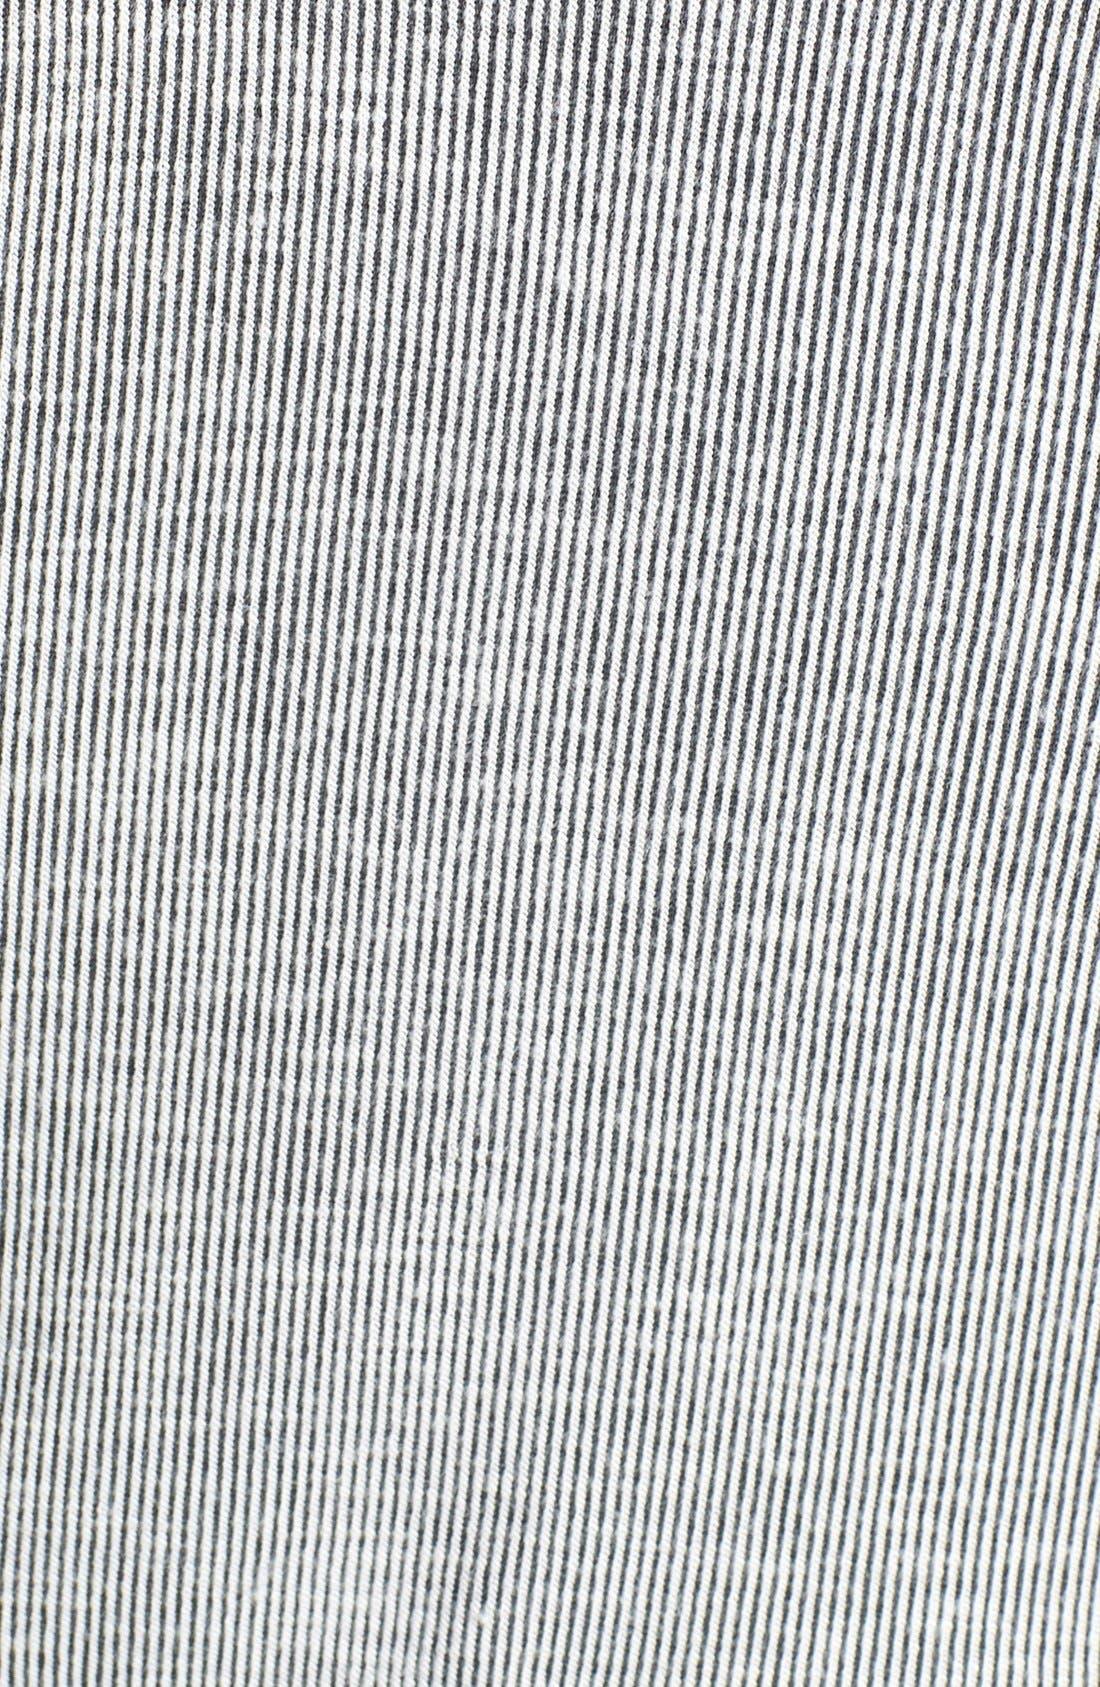 CSBLA 'Bari' Ribbed Racerback Crop Top,                             Alternate thumbnail 4, color,                             030